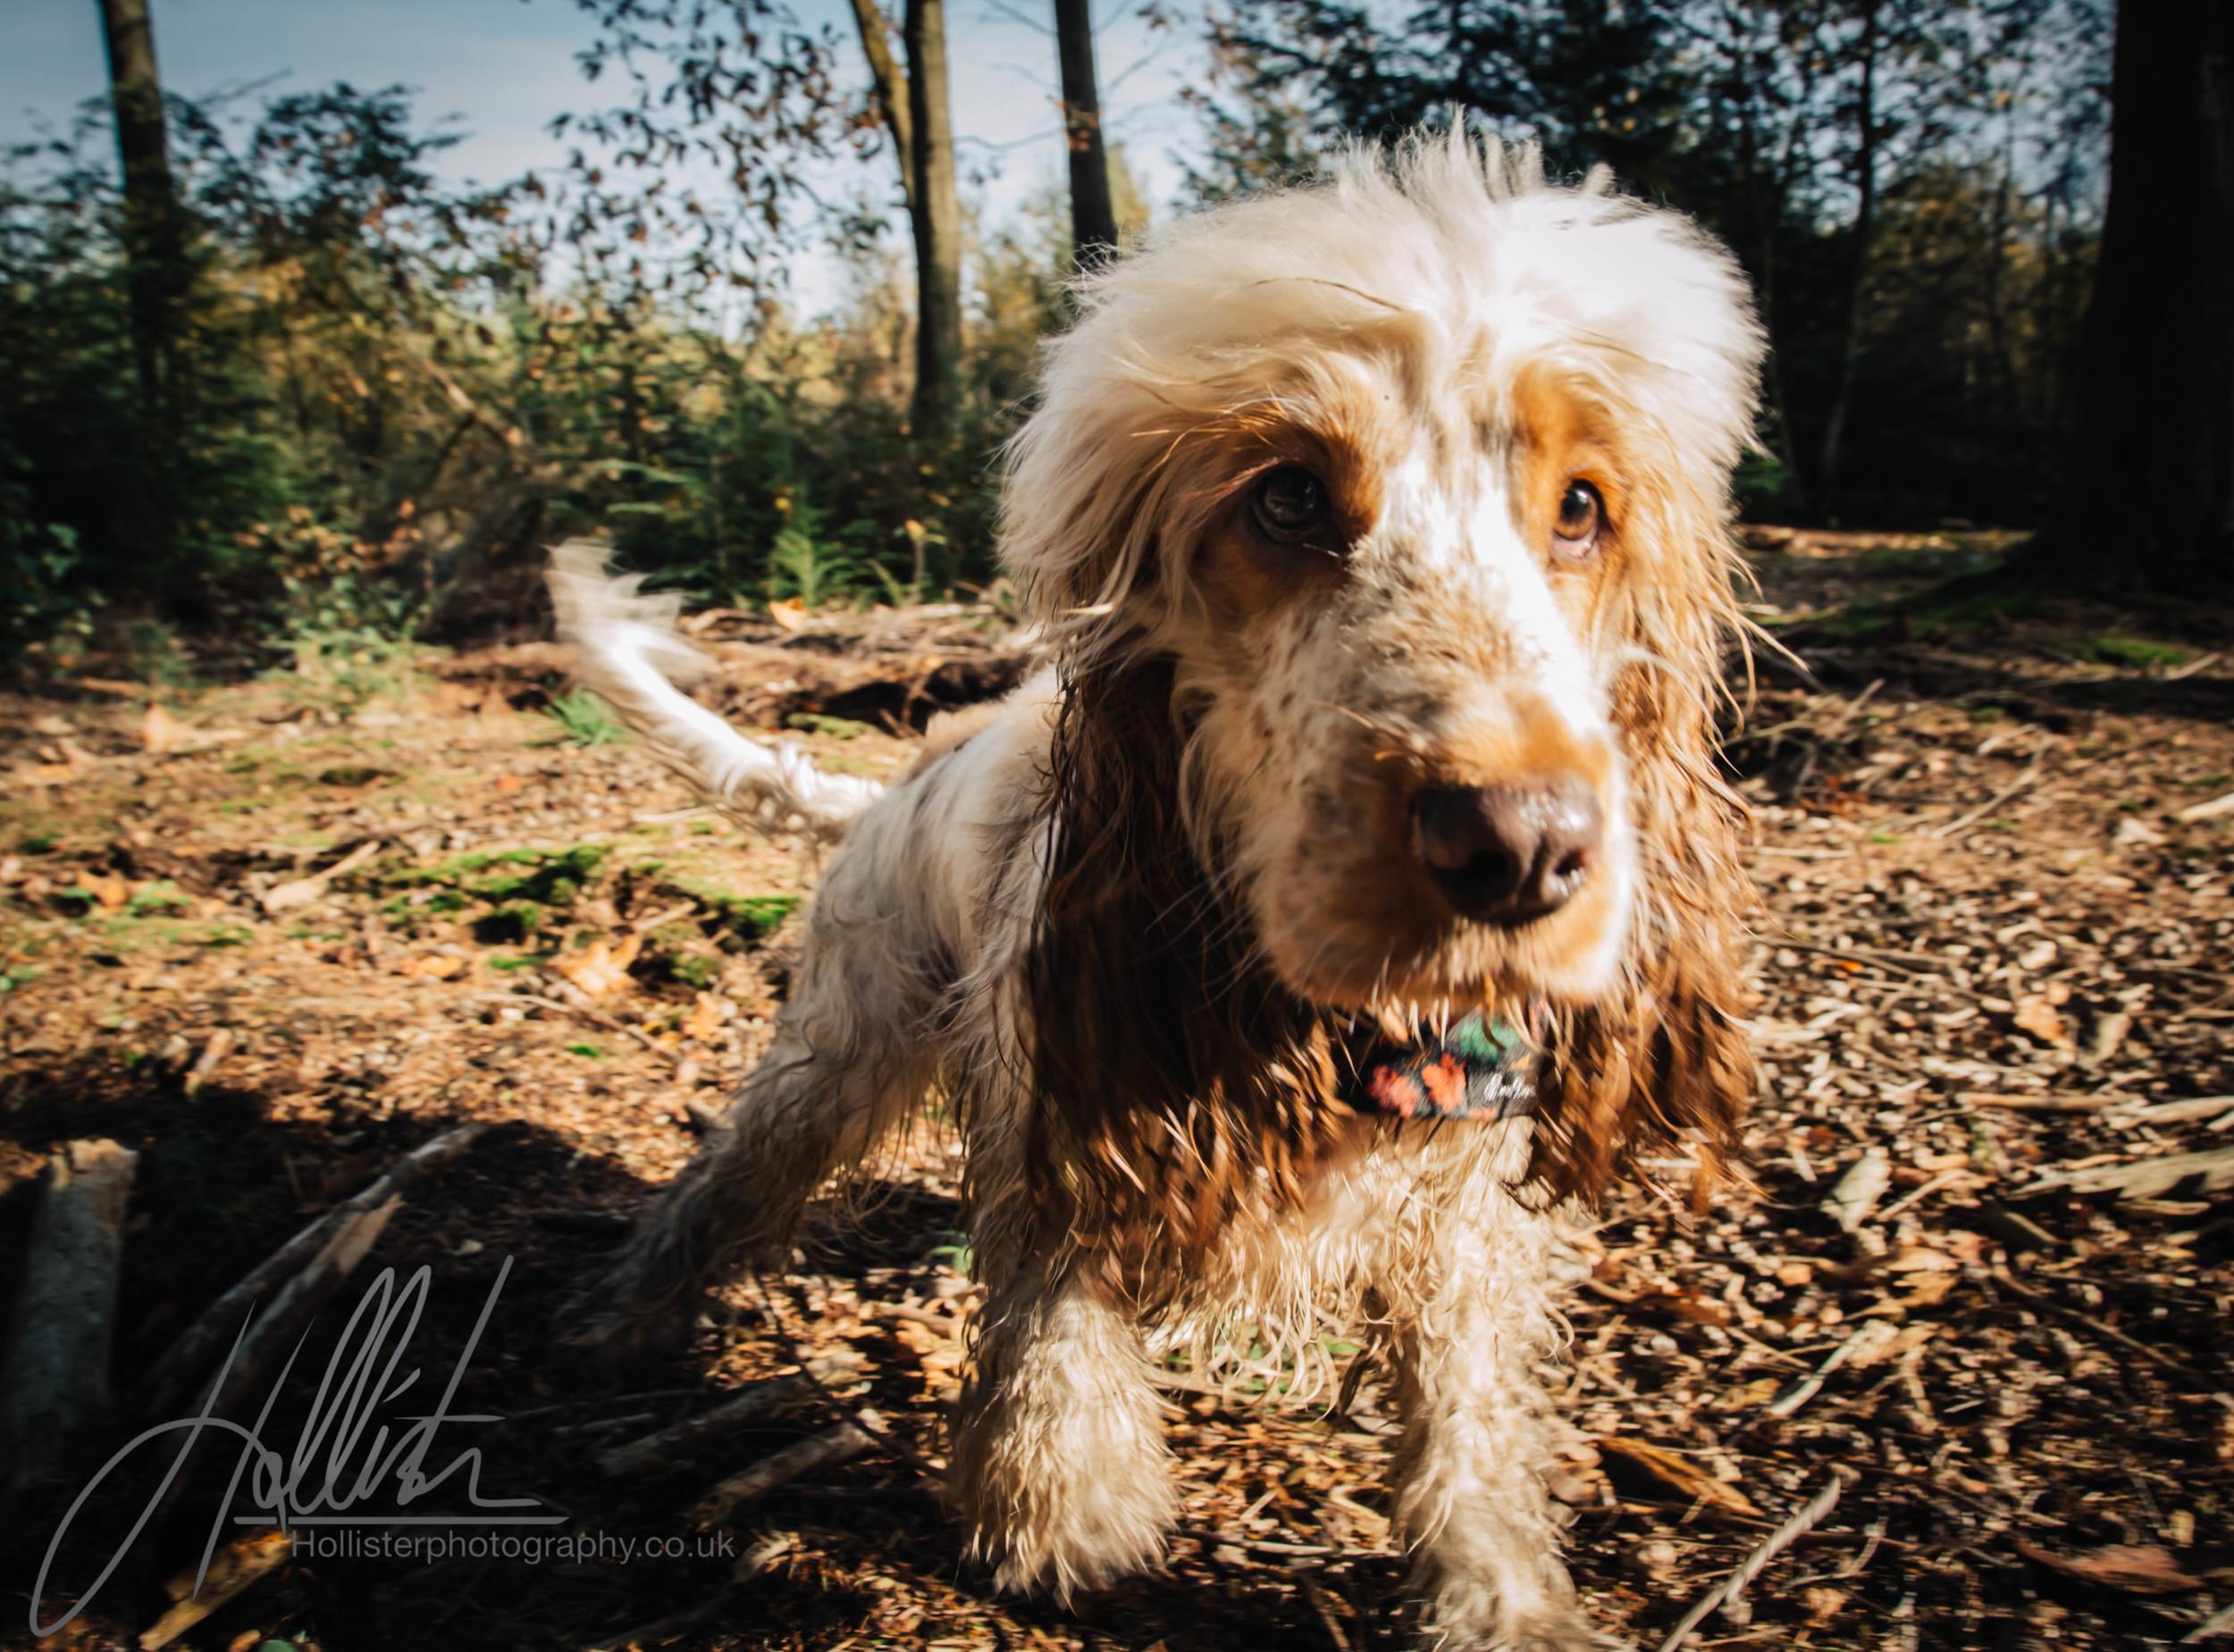 Hollisterphotography ABBY CLOWES WOOD DOG WALK-58.JPG